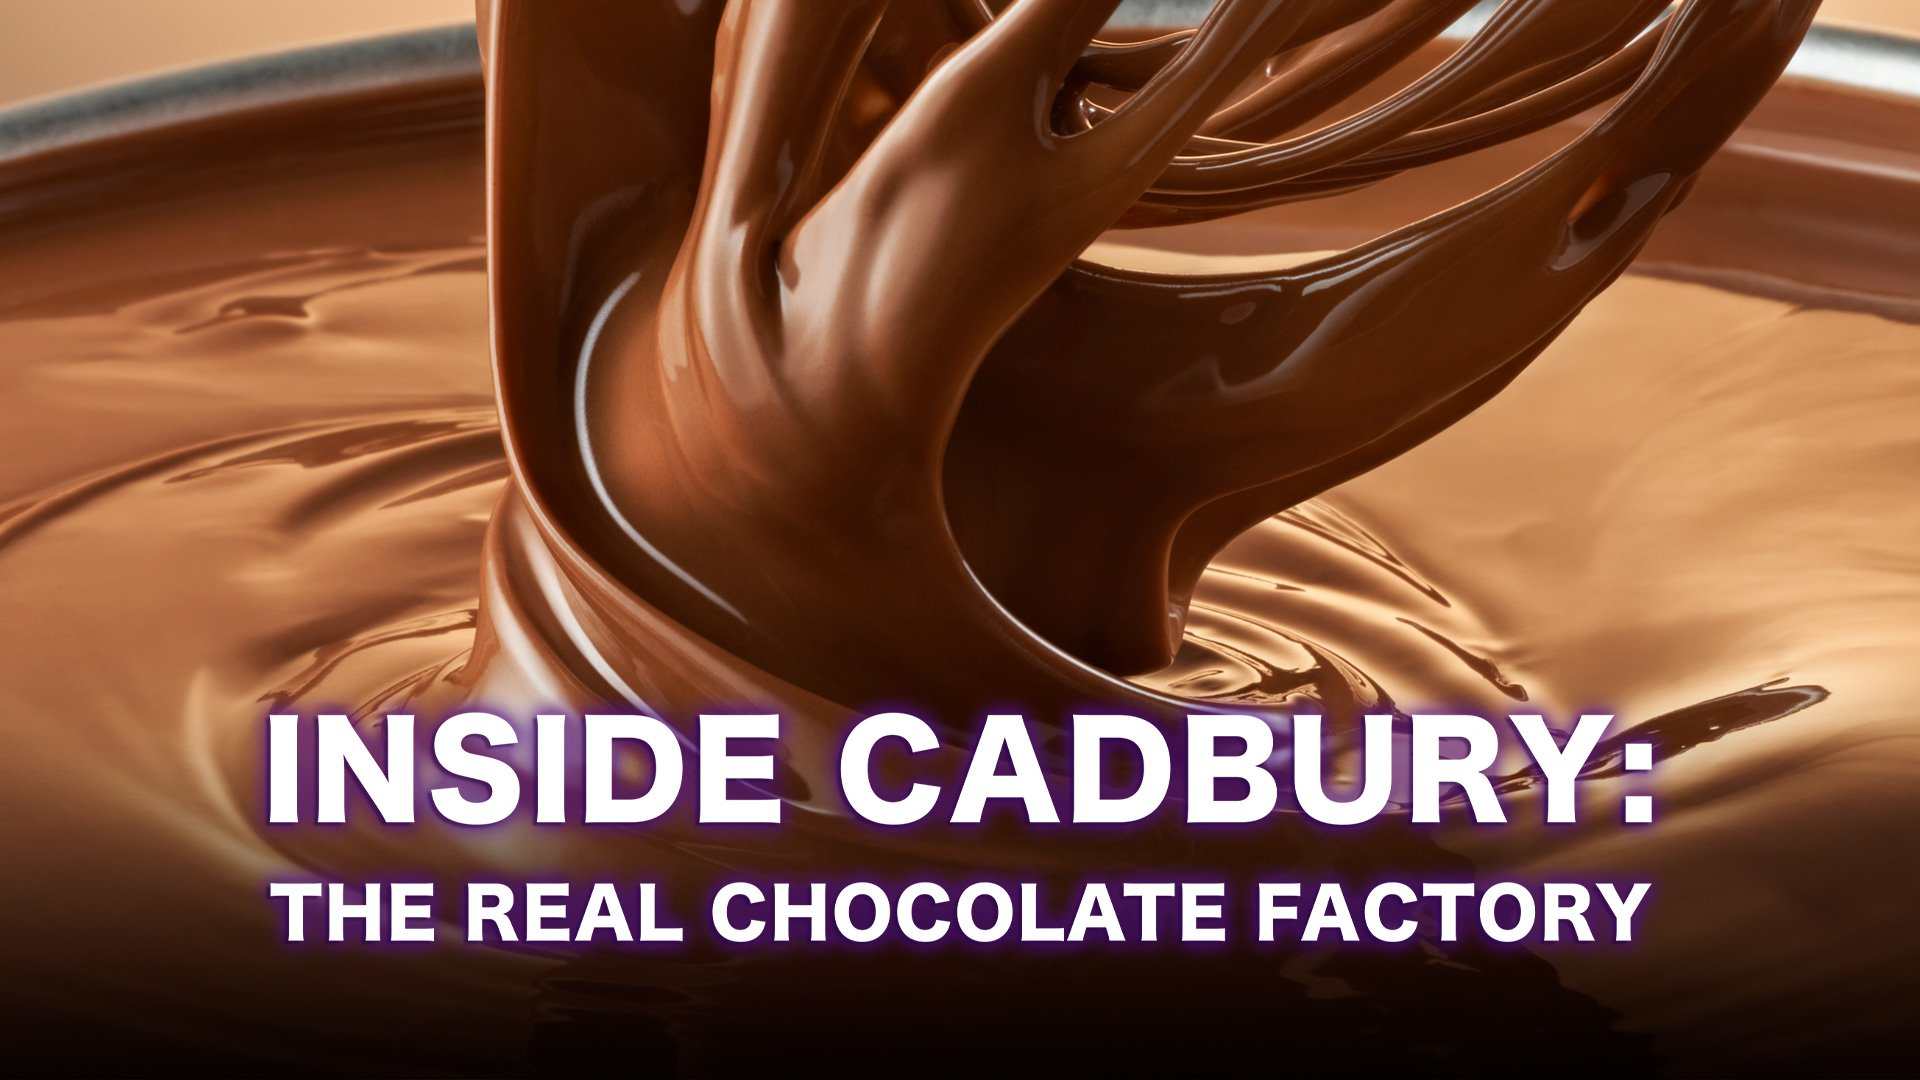 Inside Cadbury: The Real Chocolate Factory on BritBox UK